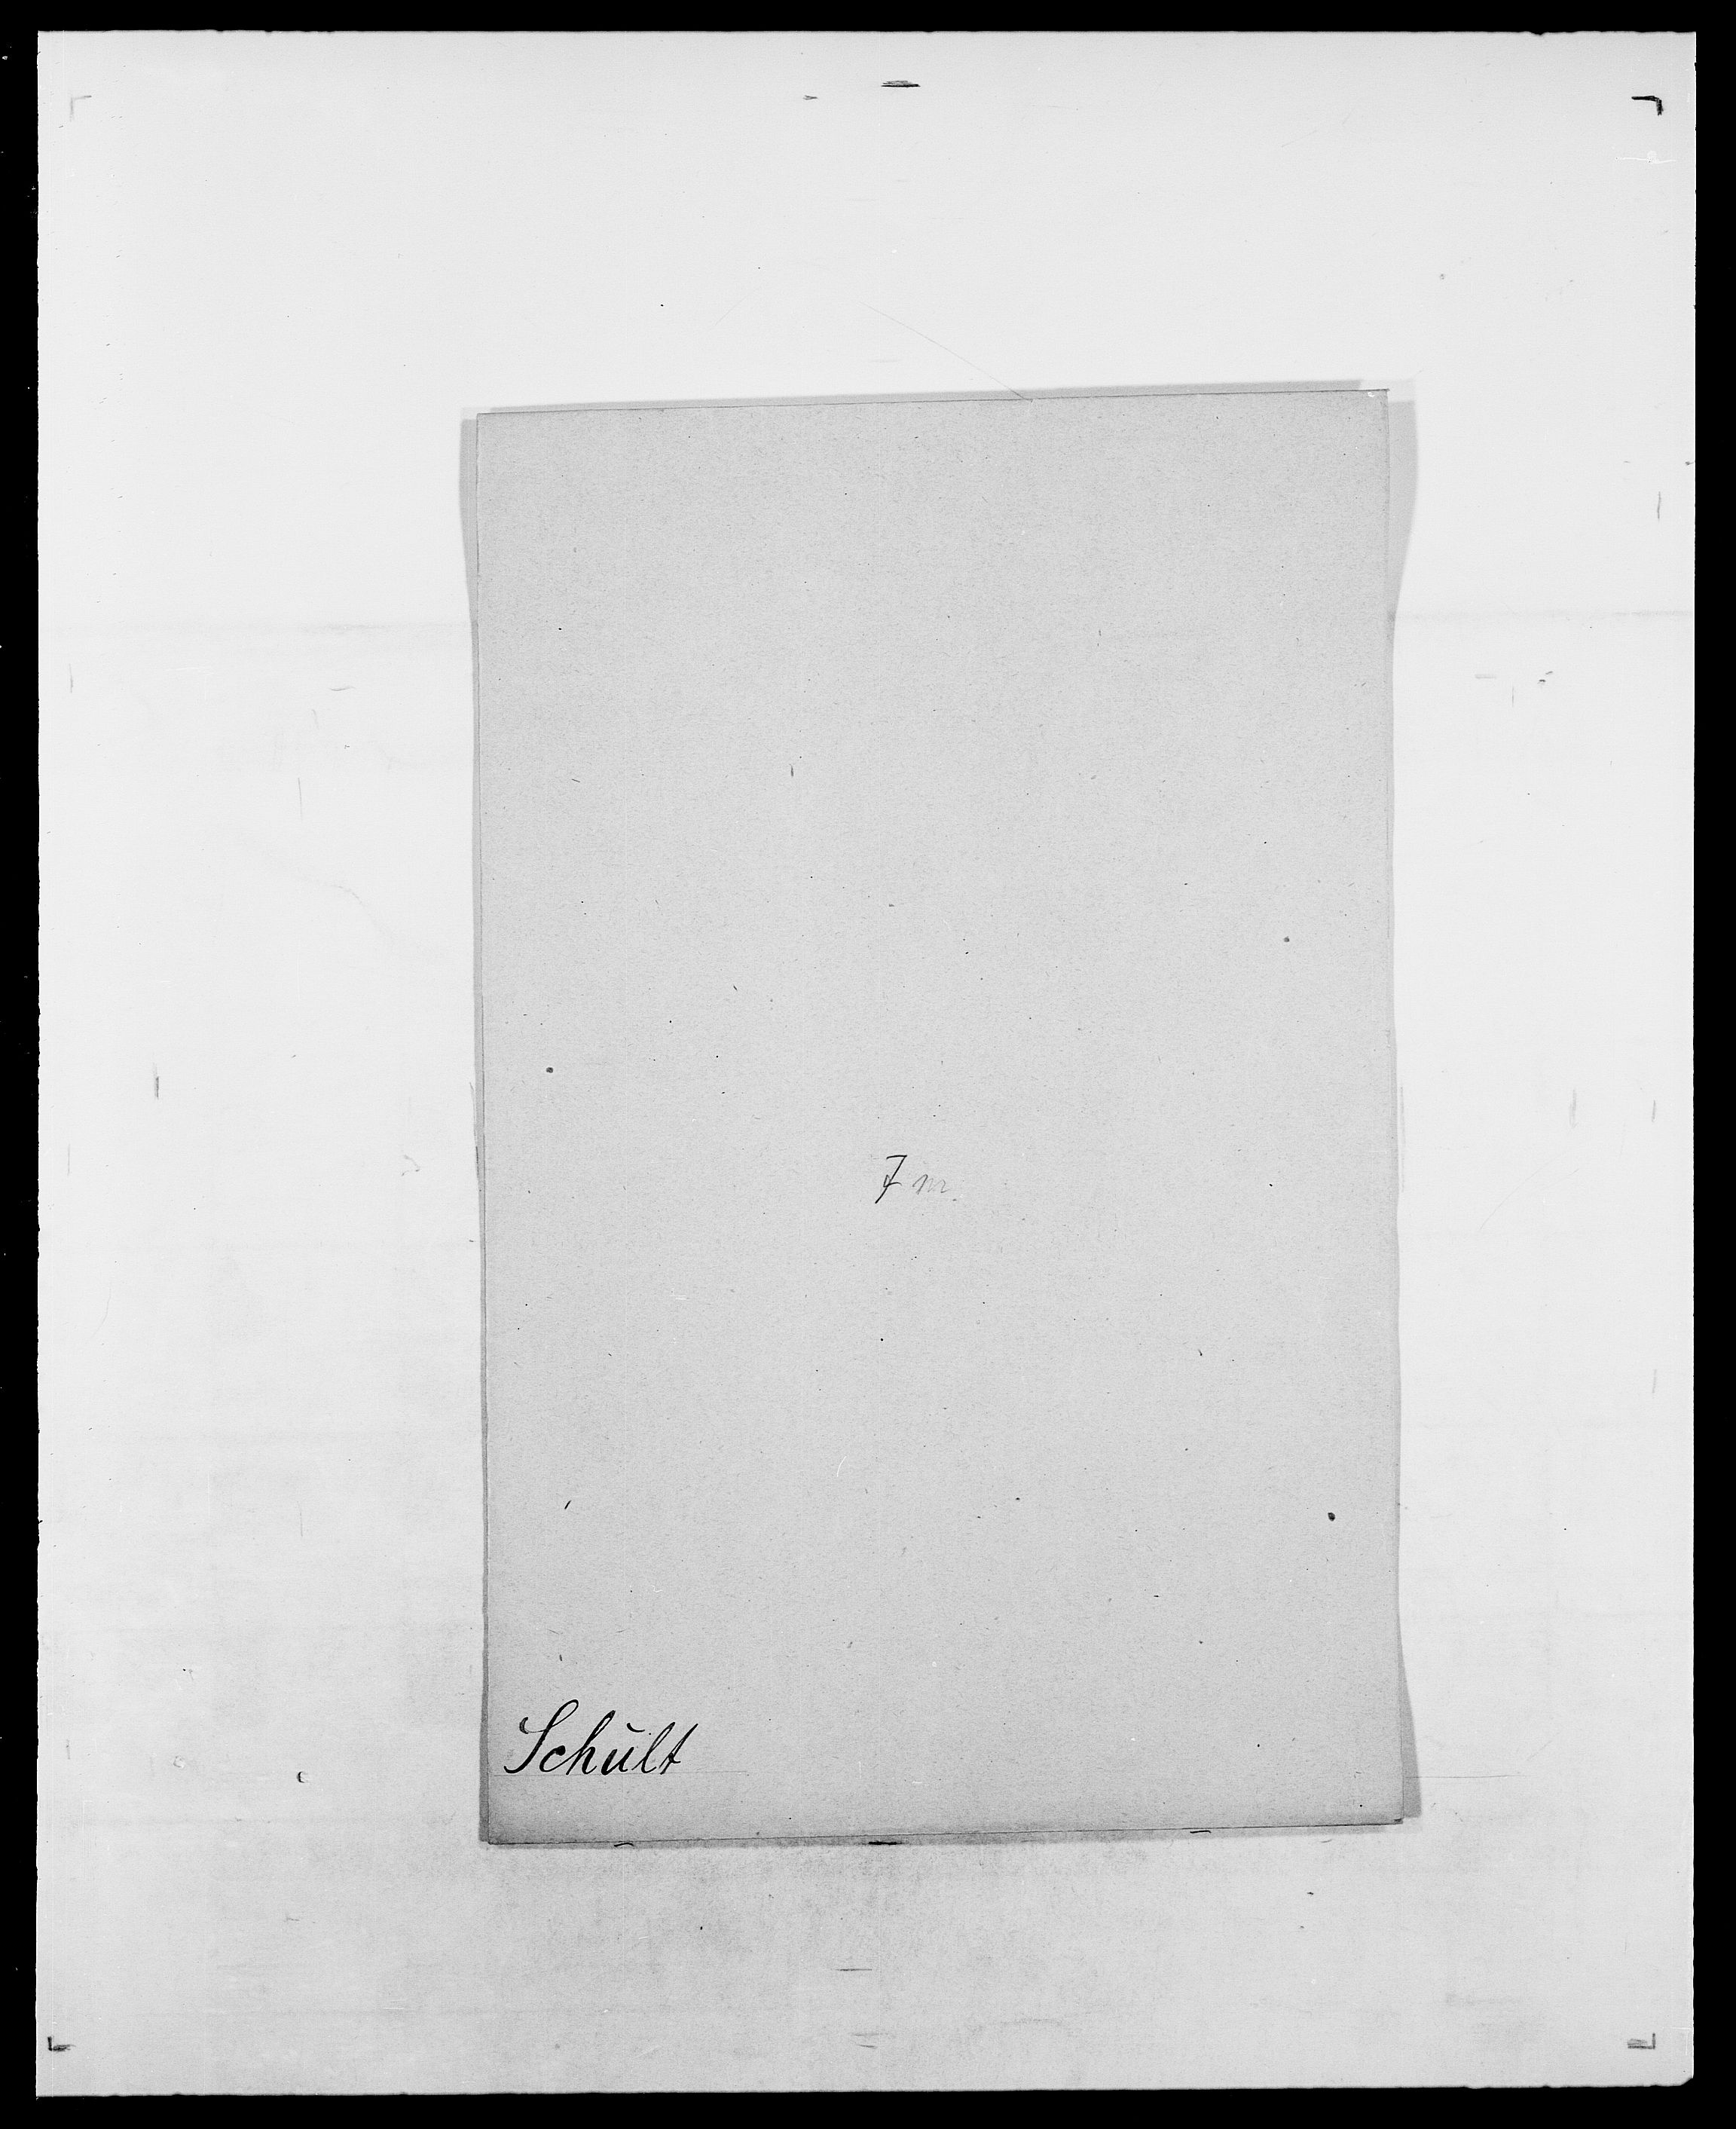 SAO, Delgobe, Charles Antoine - samling, D/Da/L0035: Schnabel - sjetman, s. 267